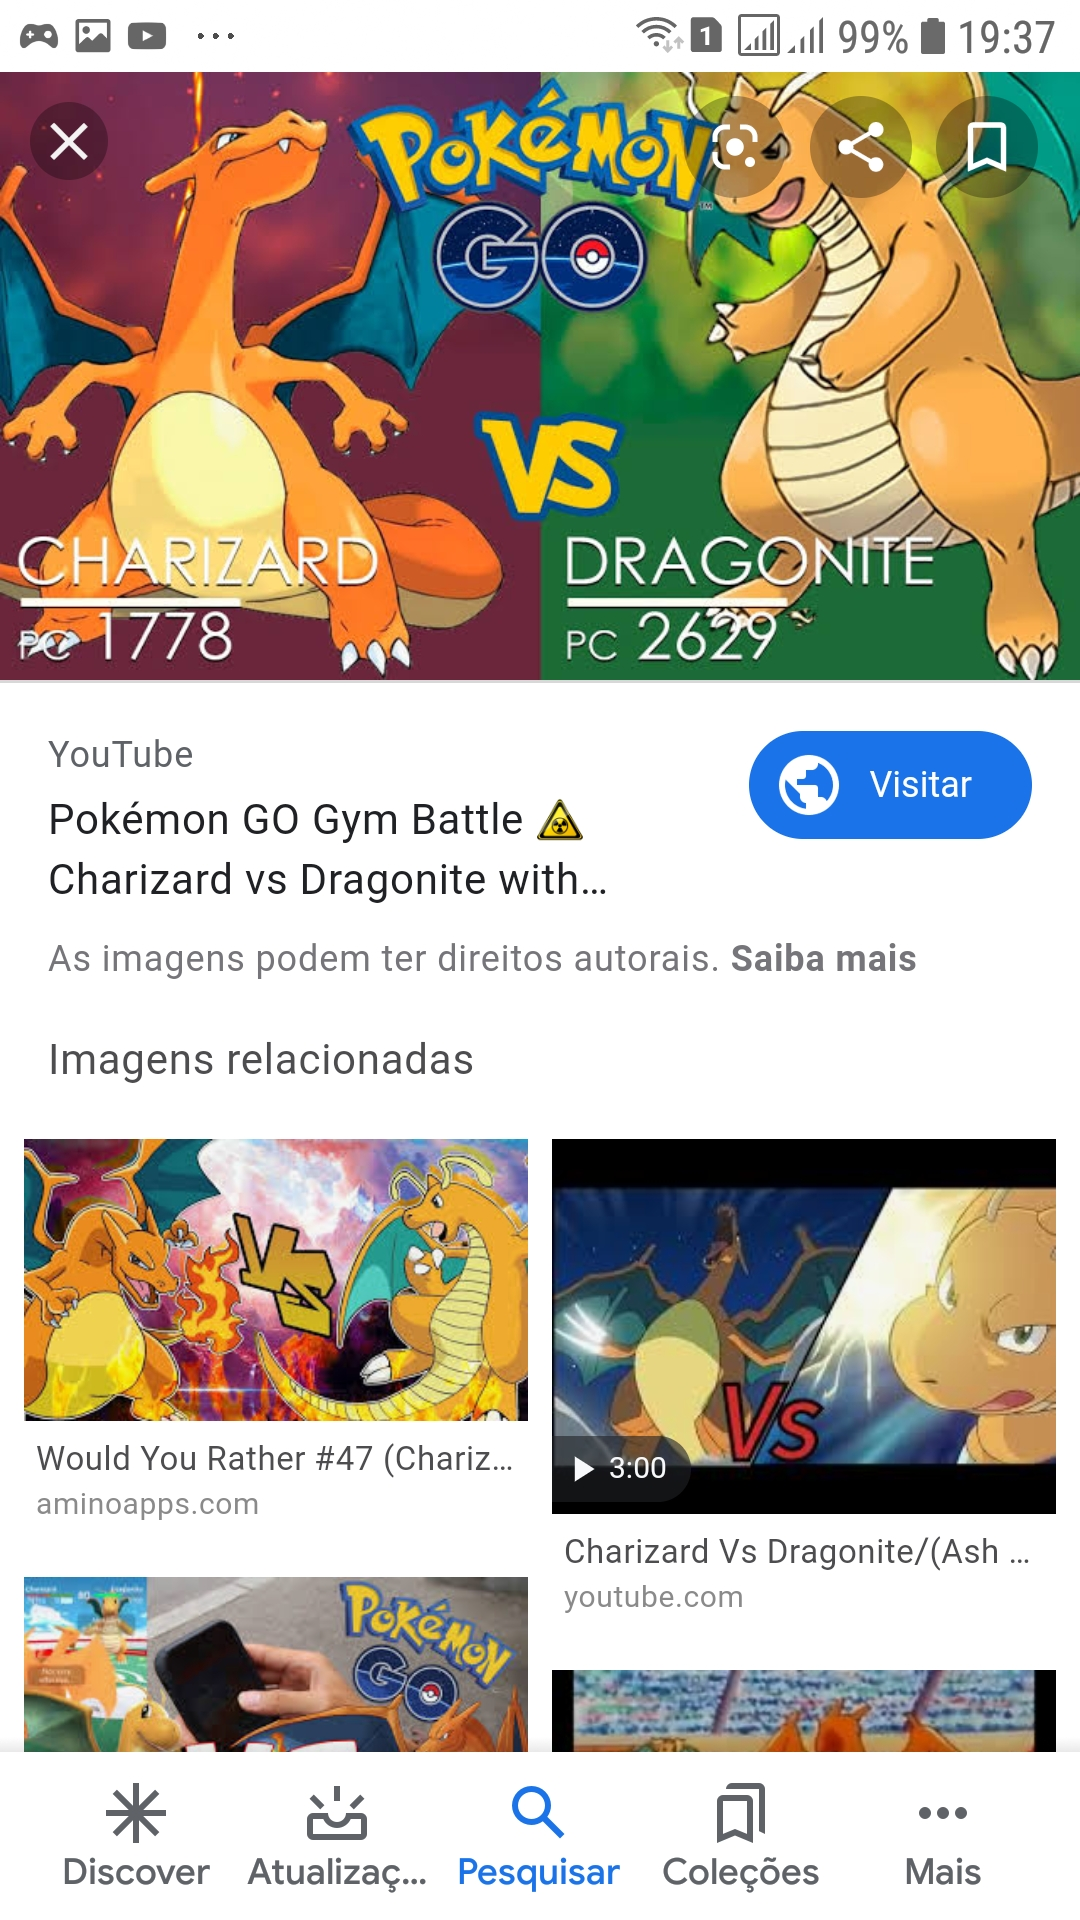 Quem ganha Charizard ou Dragonite